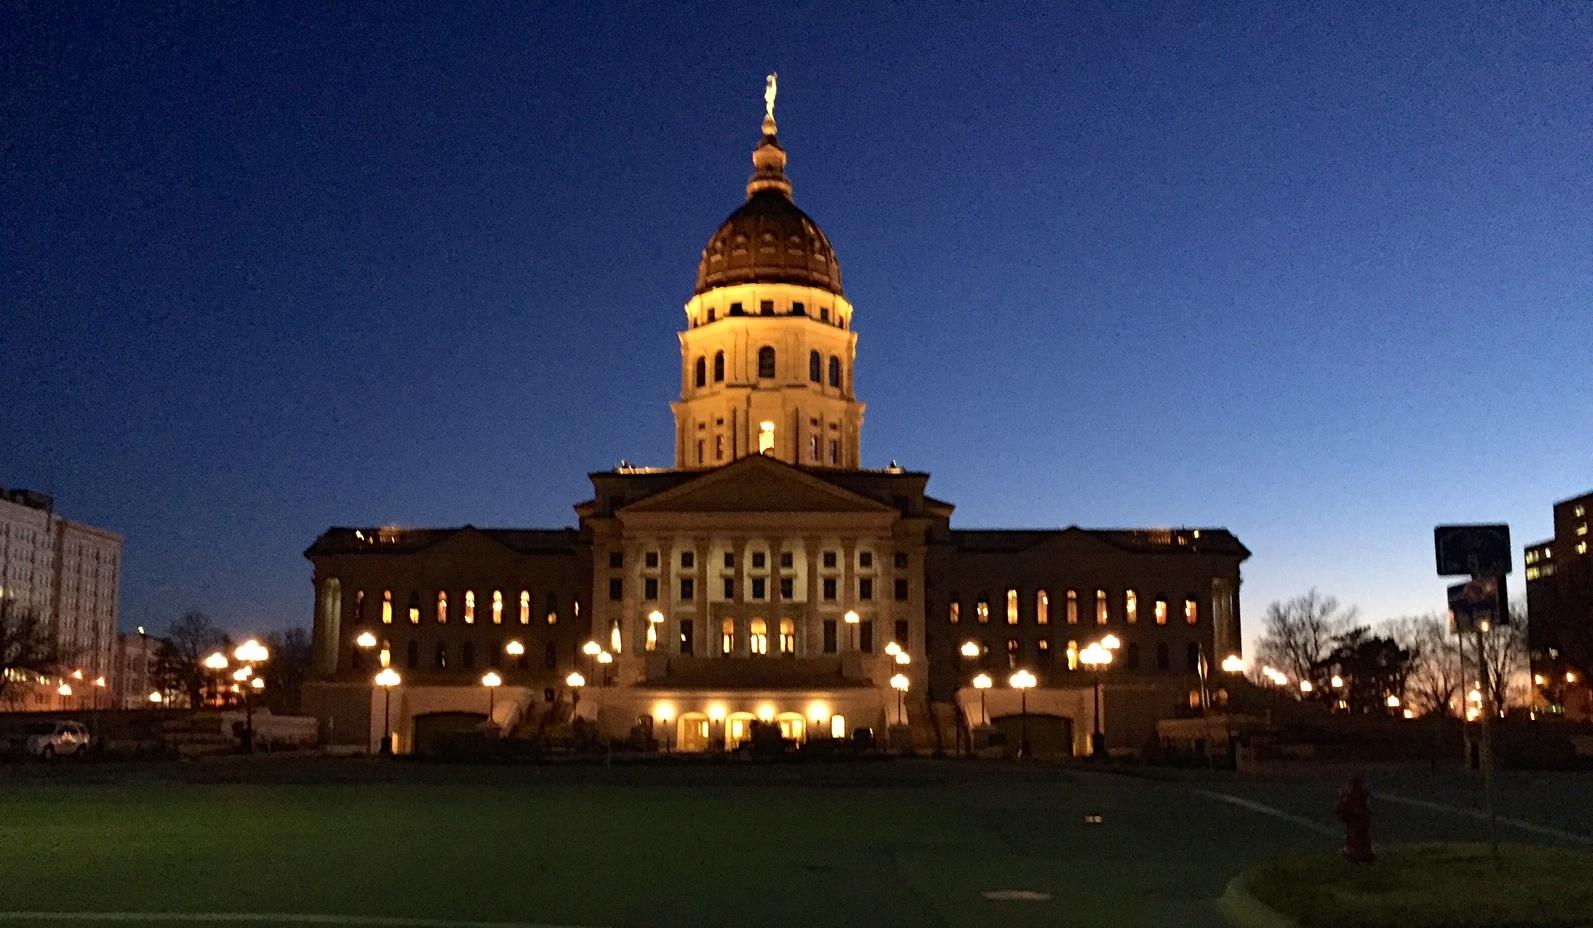 Kansas State Capital - Sam Zeff